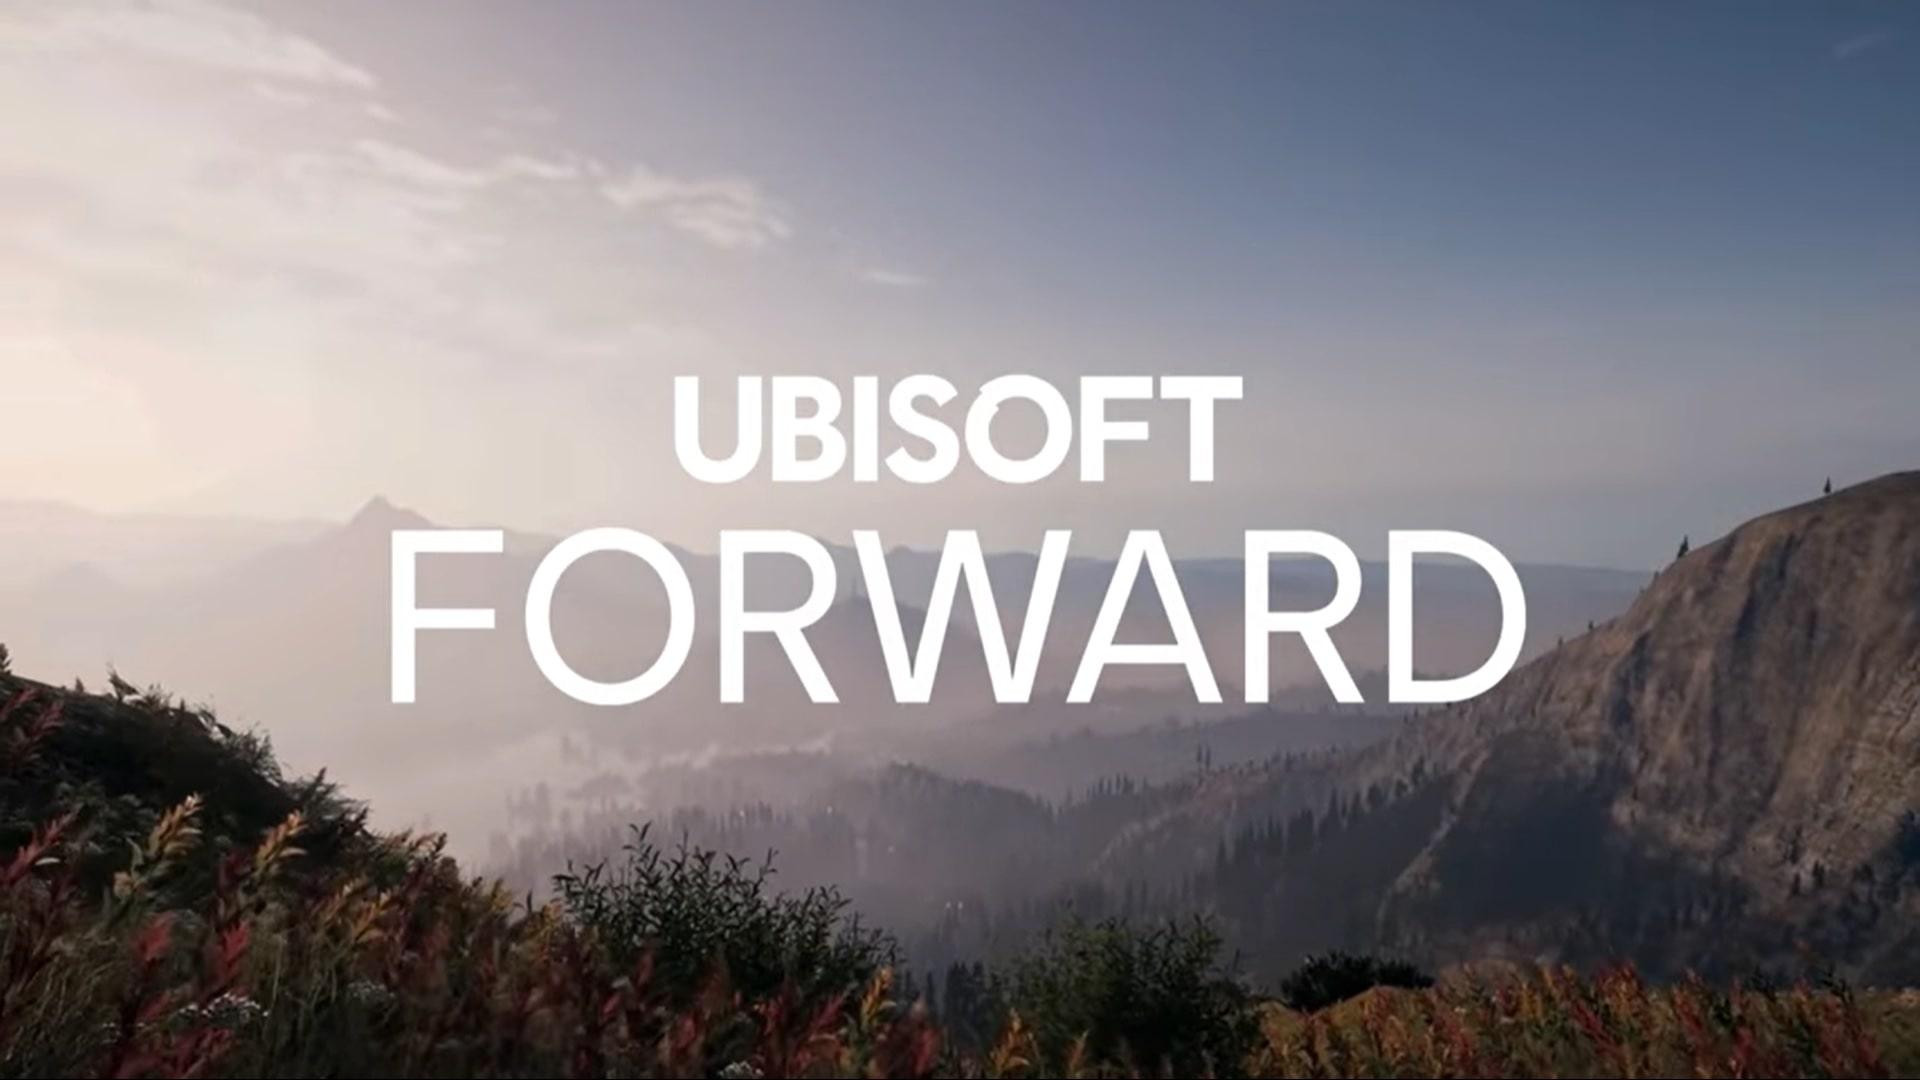 ubisoft forward settembre